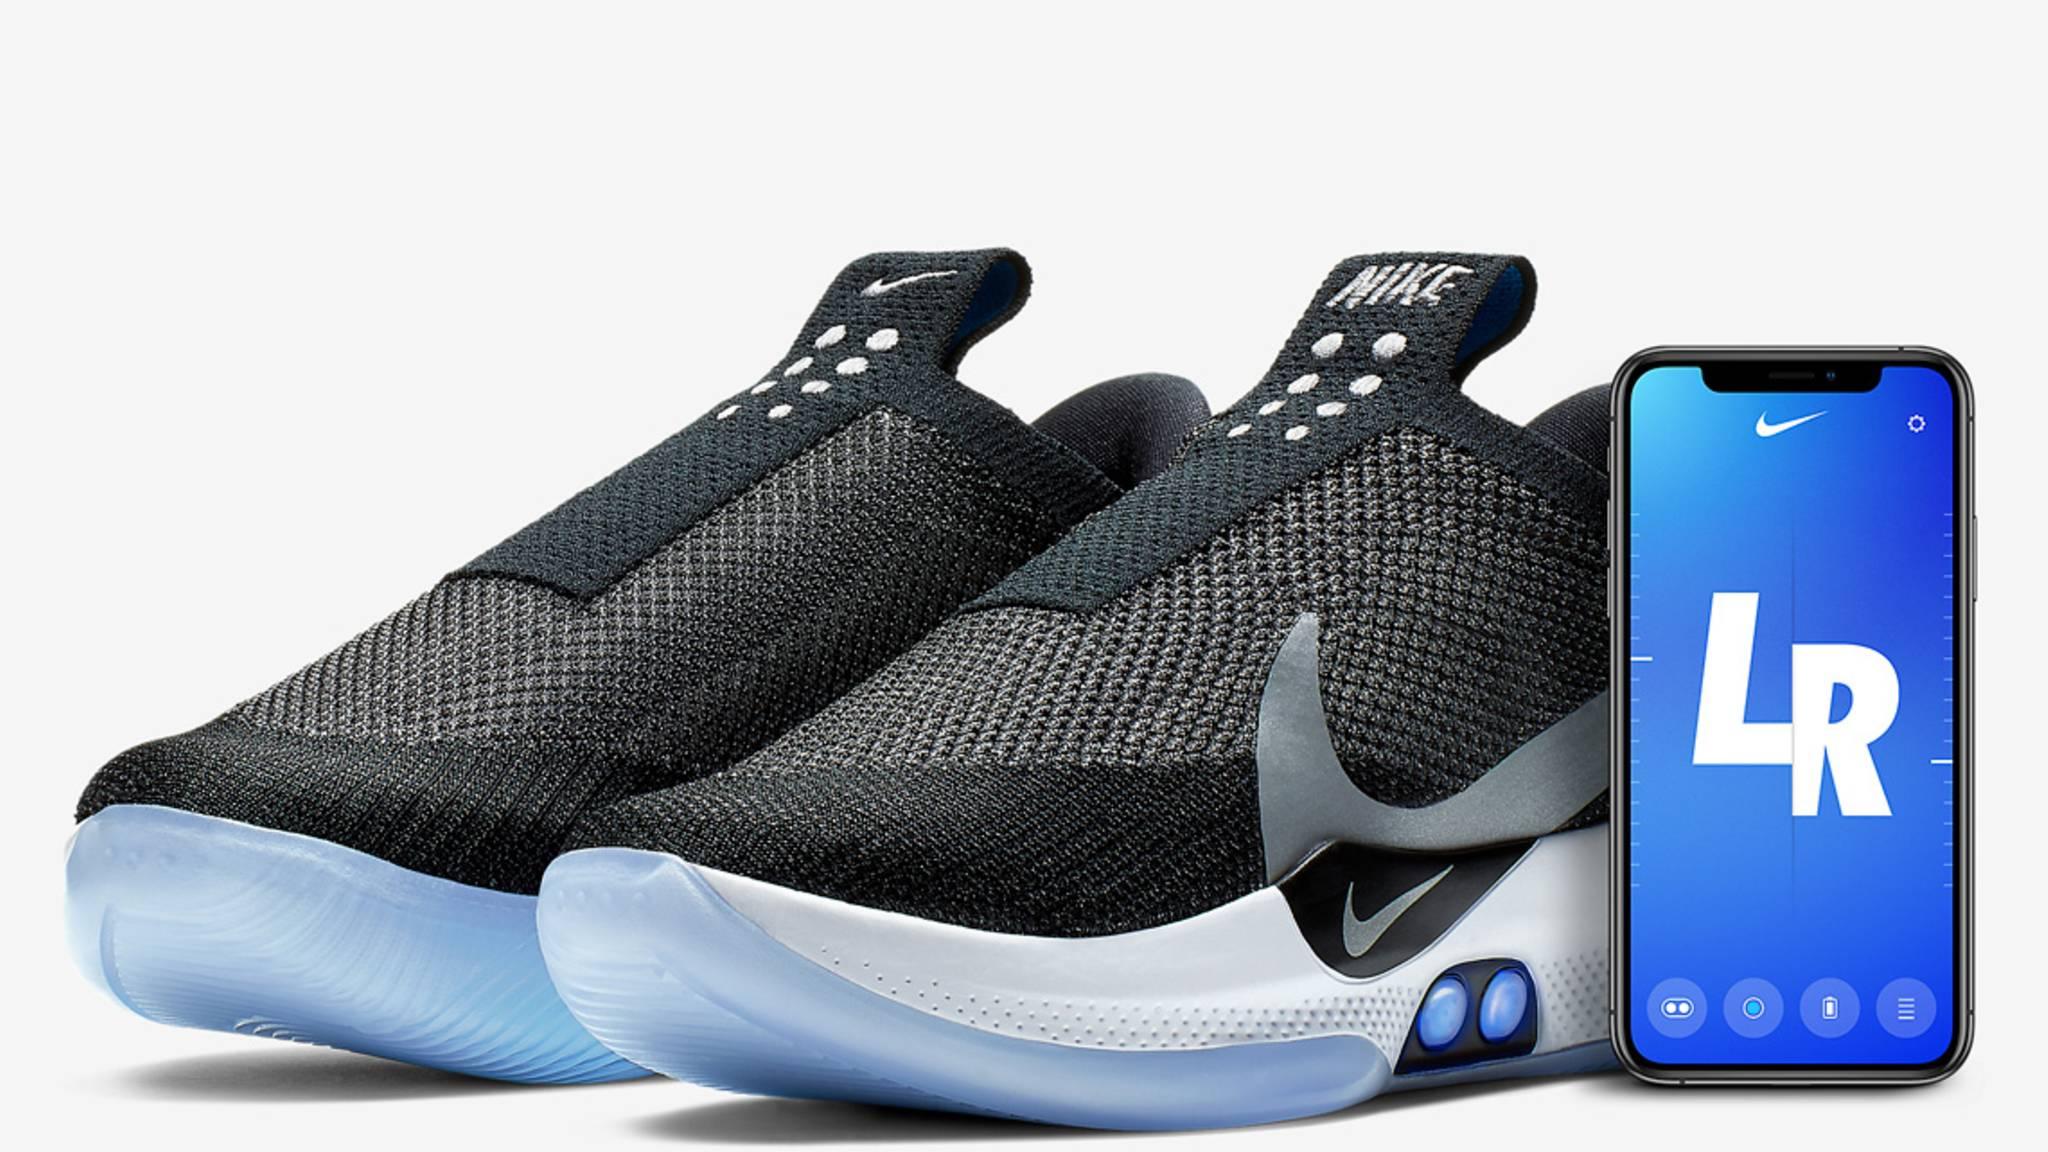 Nike Turnschuhe Beige Test Vergleich +++ Nike Turnschuhe